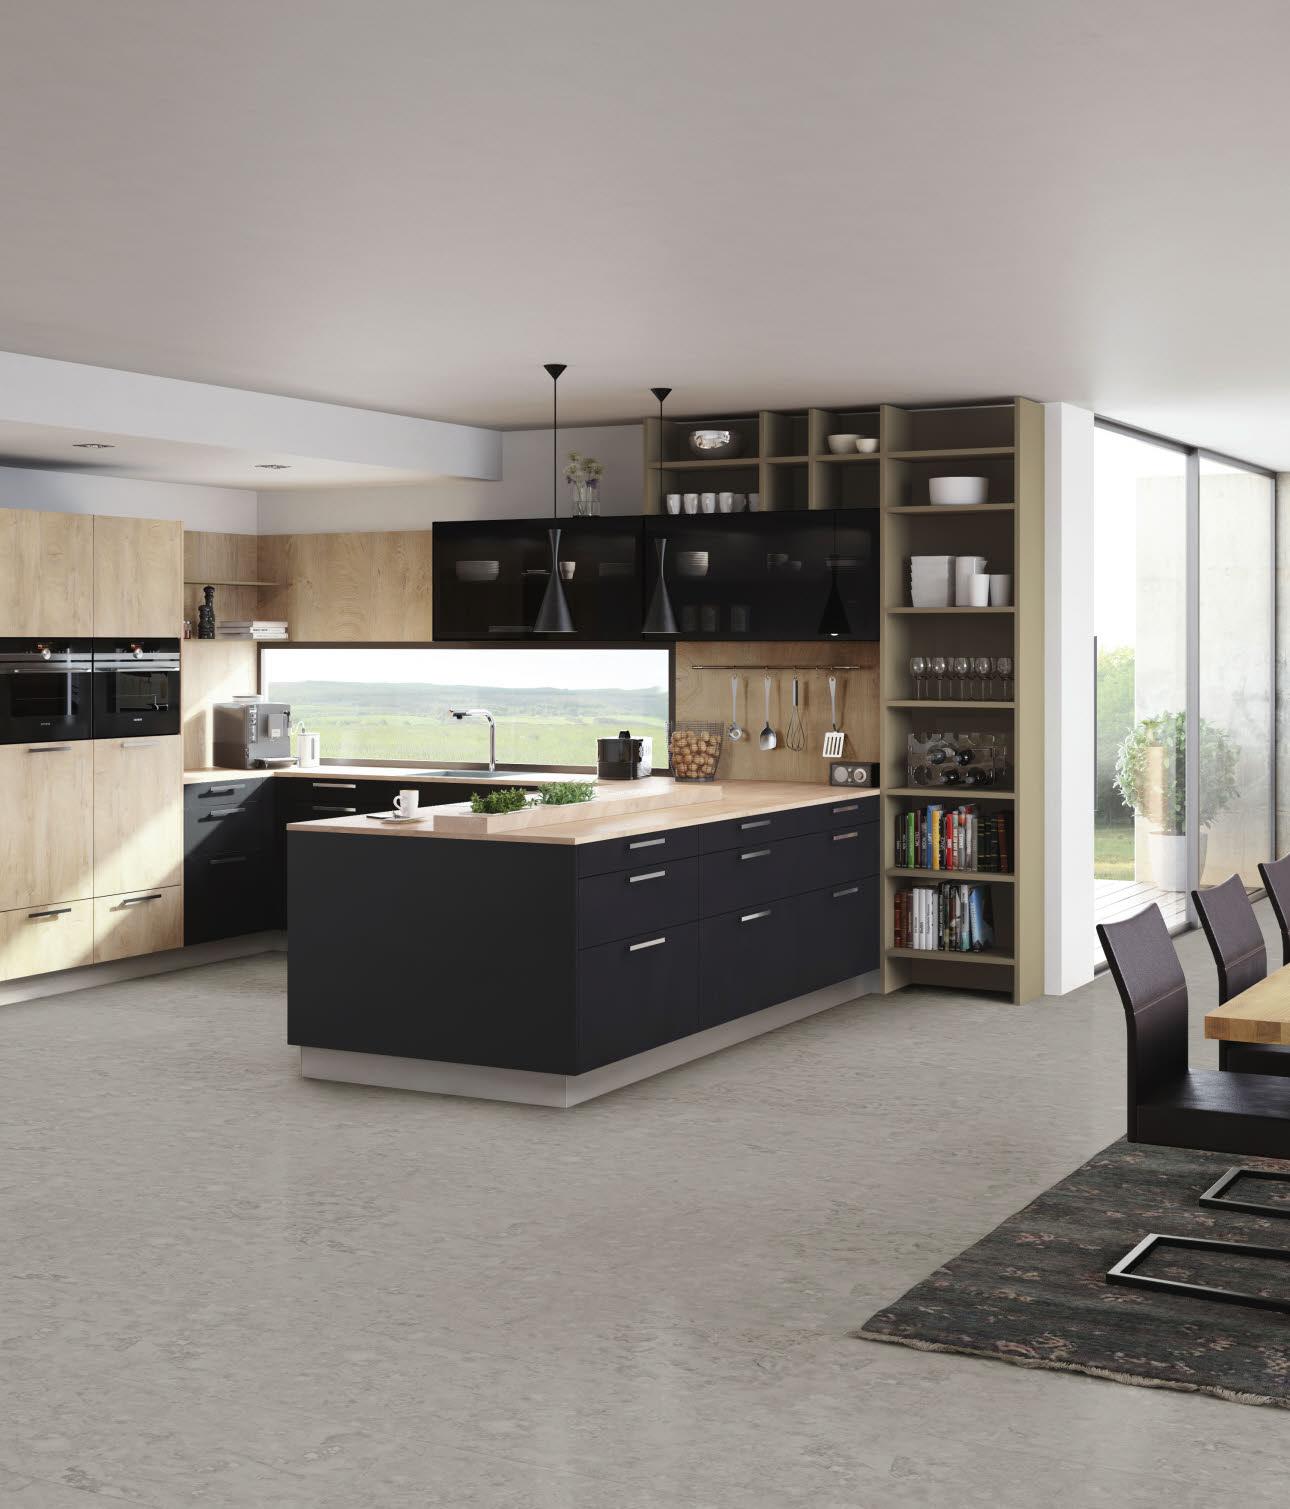 beliebtes interieur matt schwarze kchen. Black Bedroom Furniture Sets. Home Design Ideas